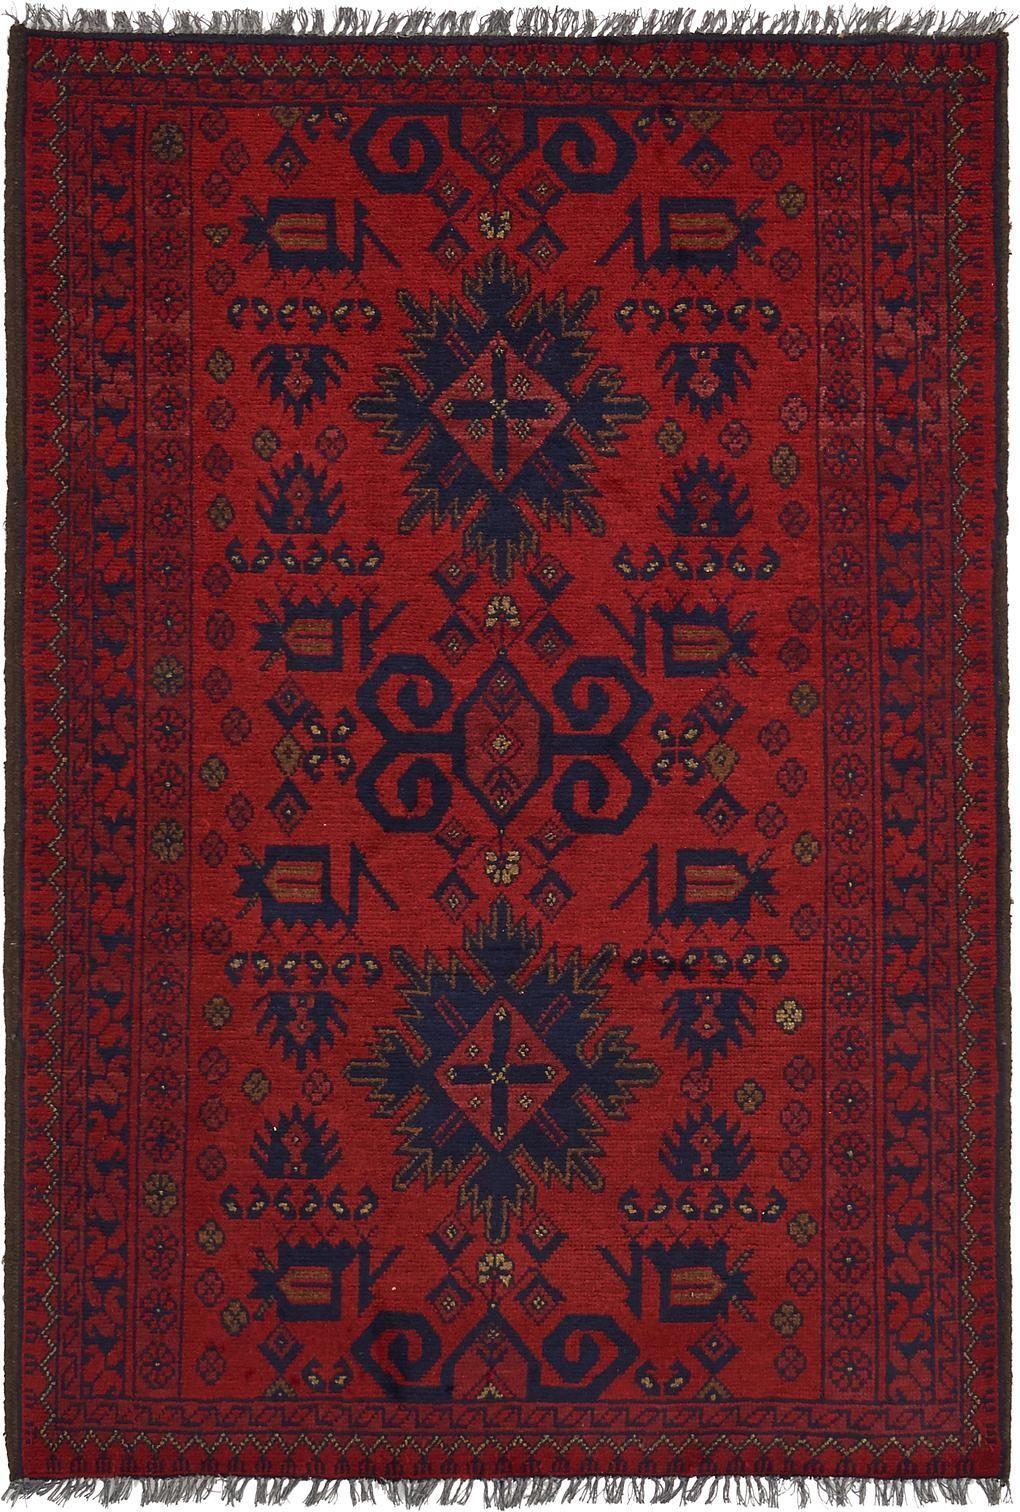 Red 3 4 X 4 9 Khal Mohammadi Oriental Rug